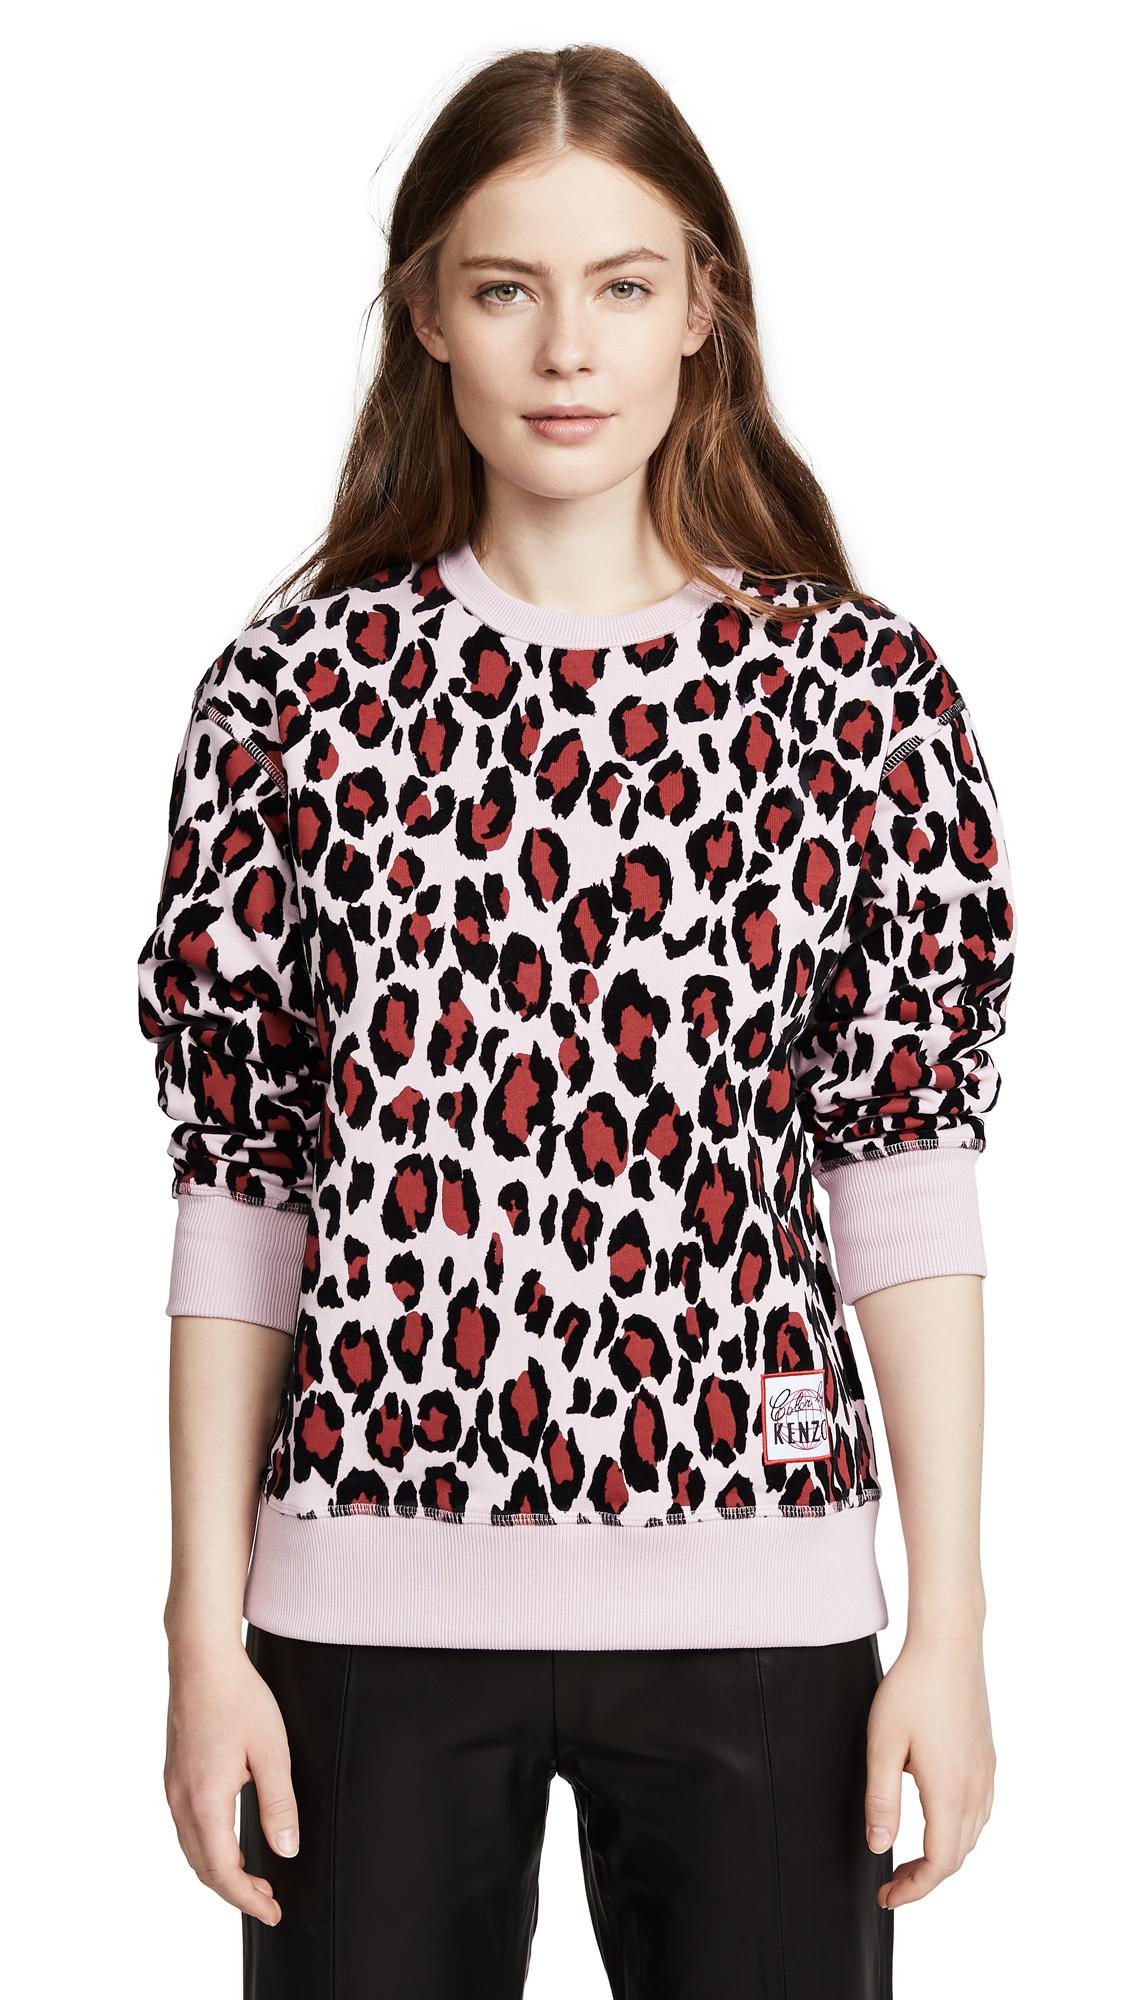 KENZO Comfort Sweatshirt - Pastel Pink